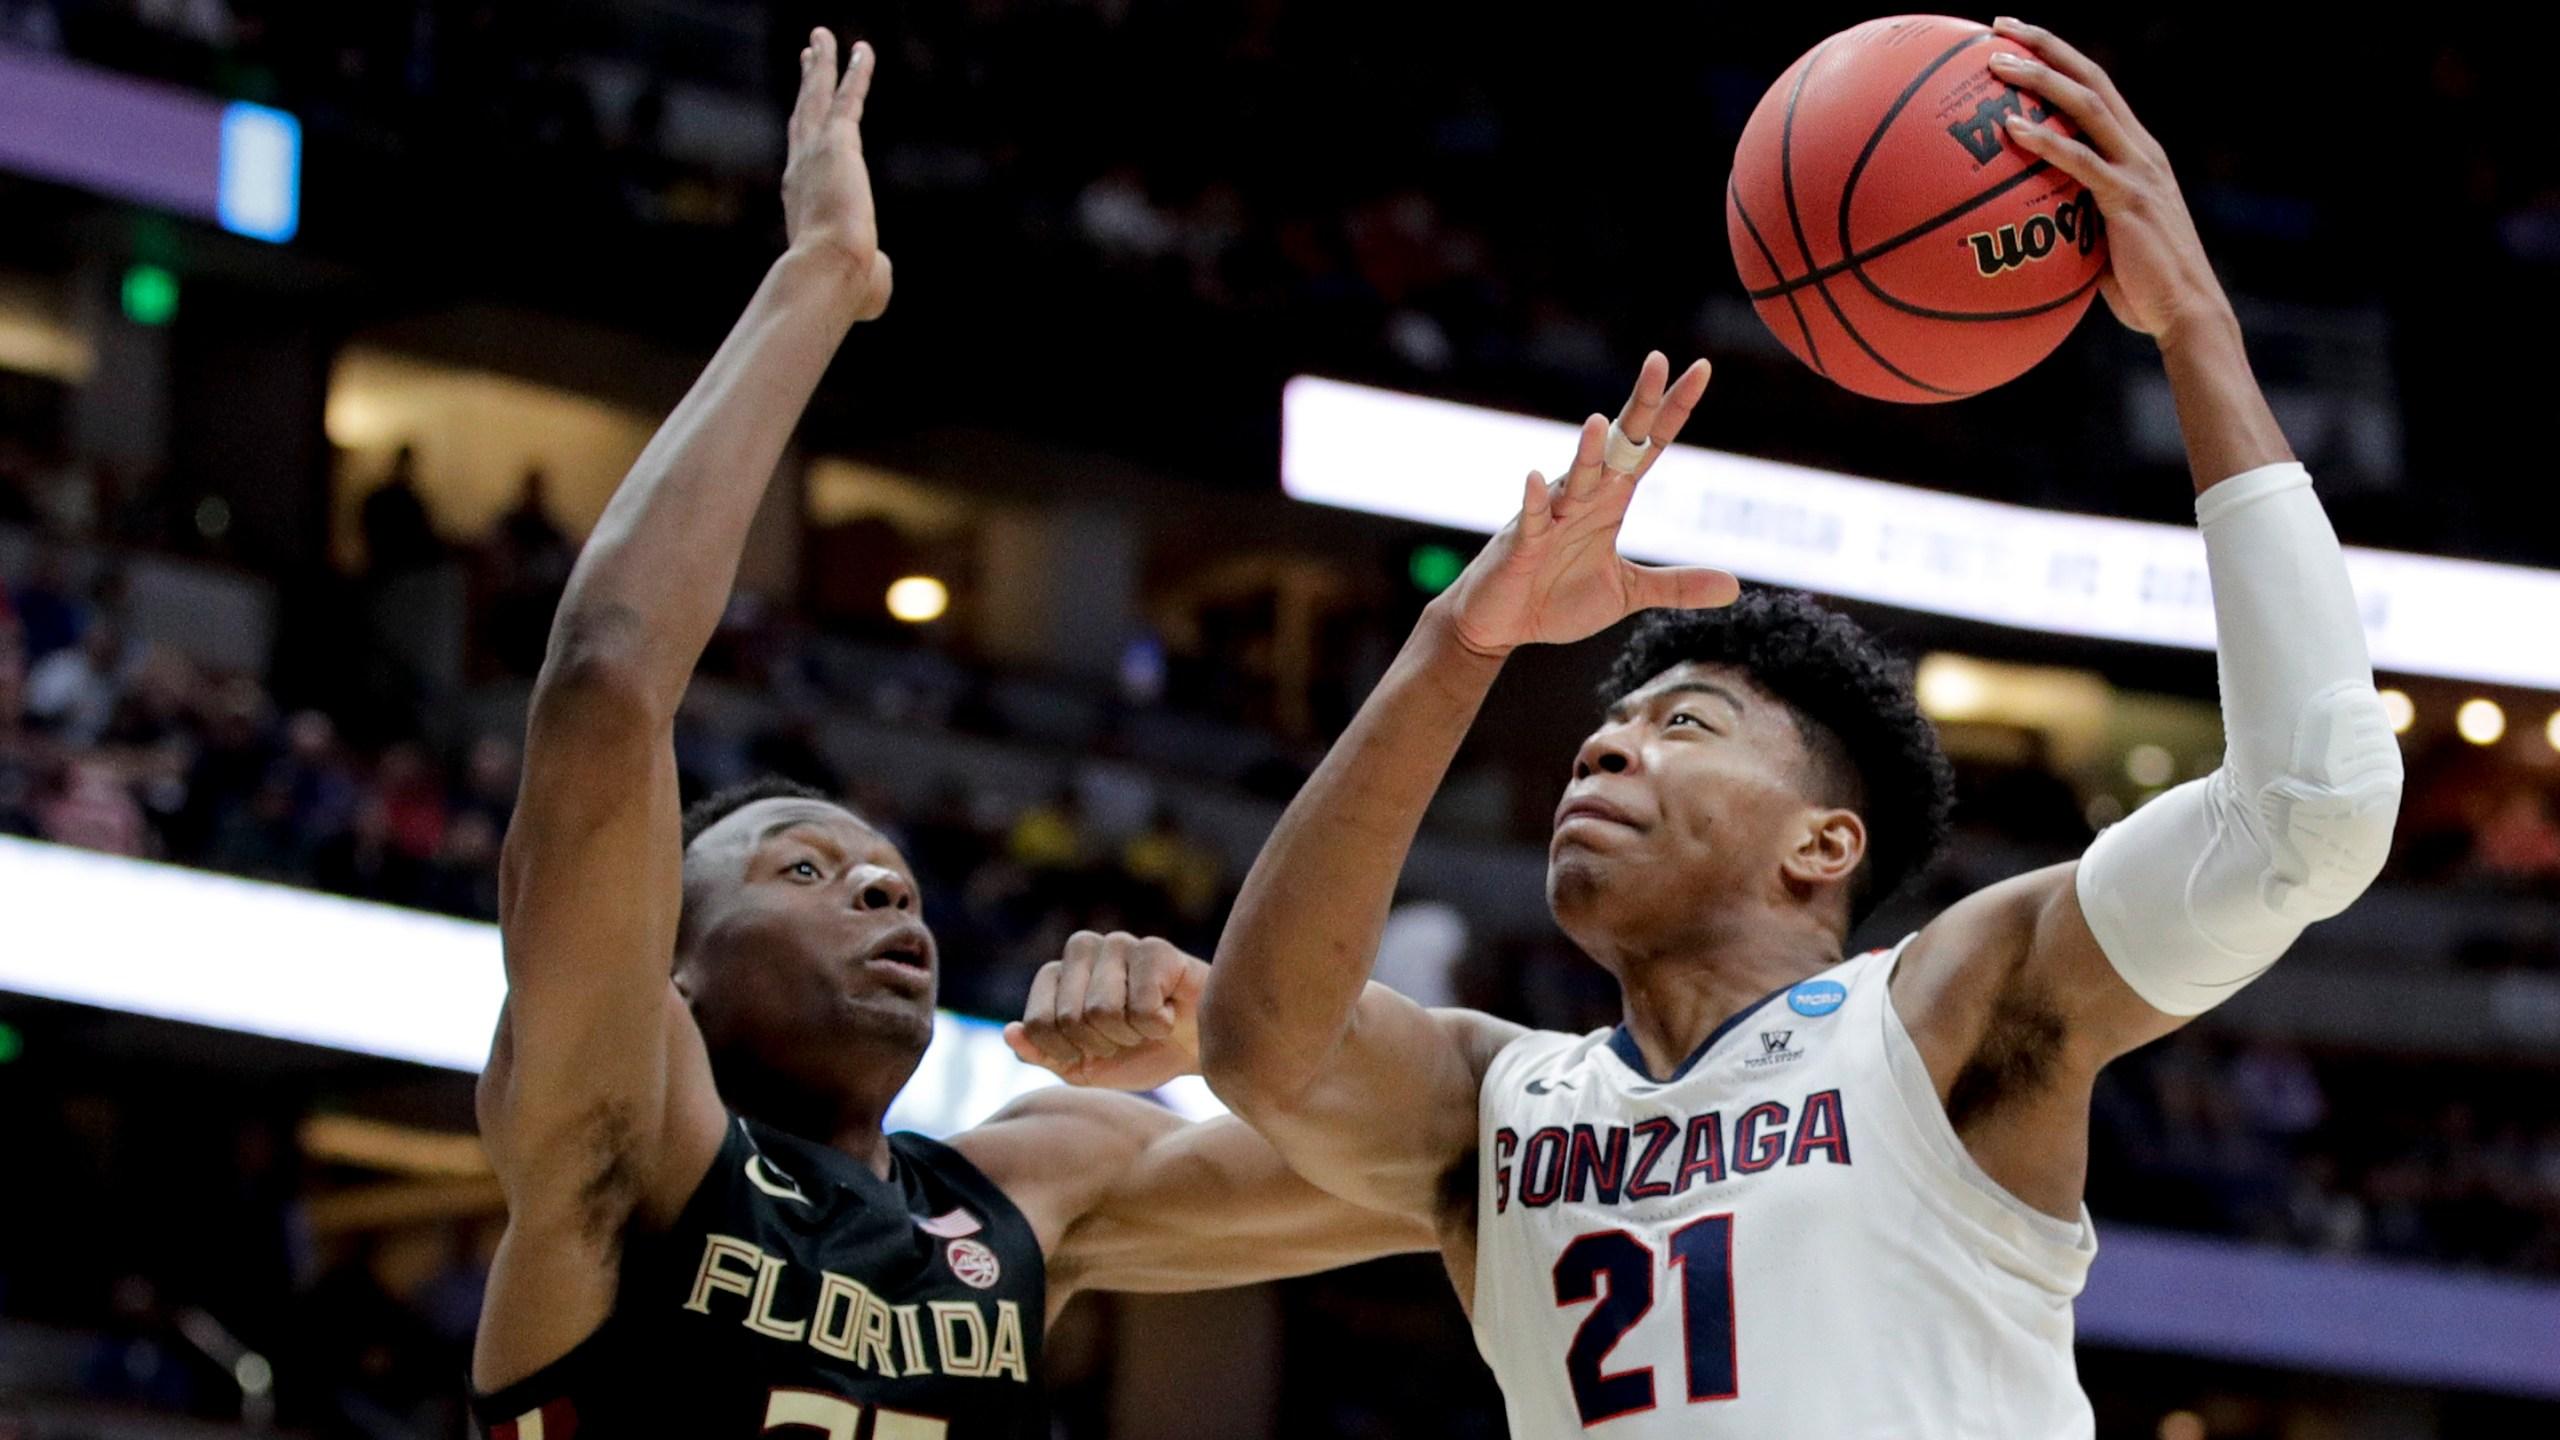 NCAA_Florida_St_Gonzaga_Basketball_74829-159532.jpg69984288